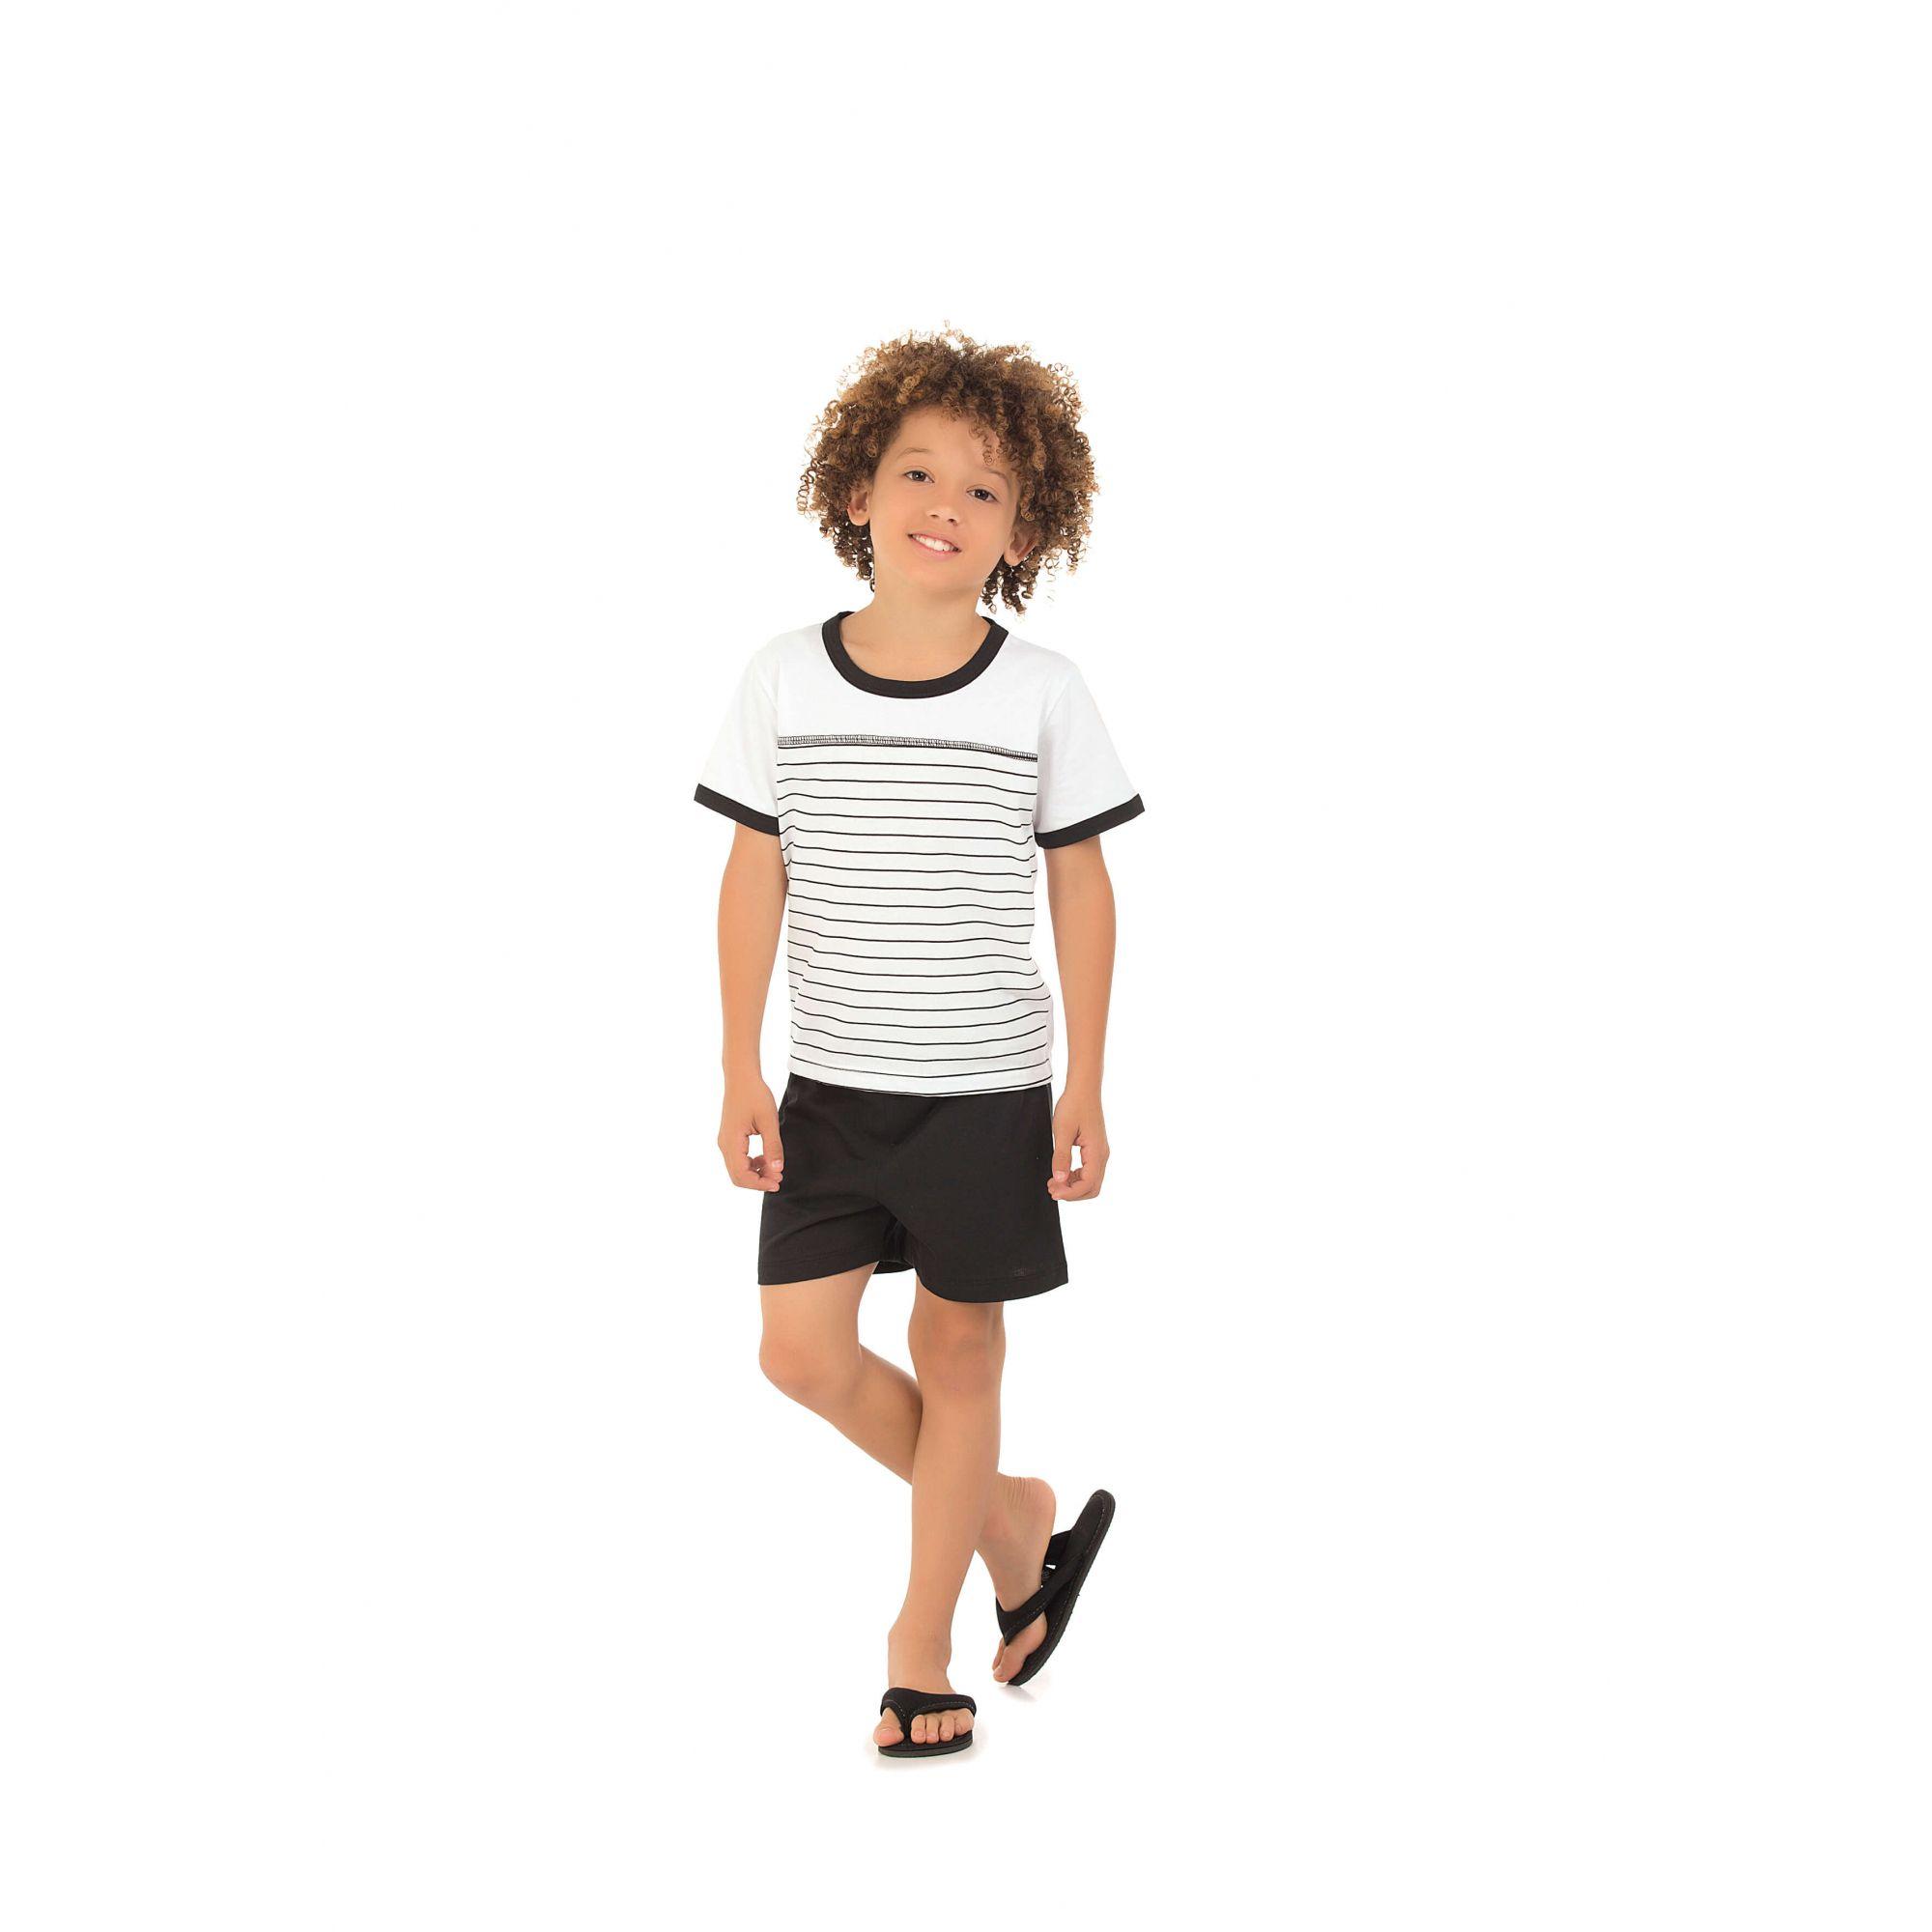 102/D - Pijama Infantil Curto Listrado